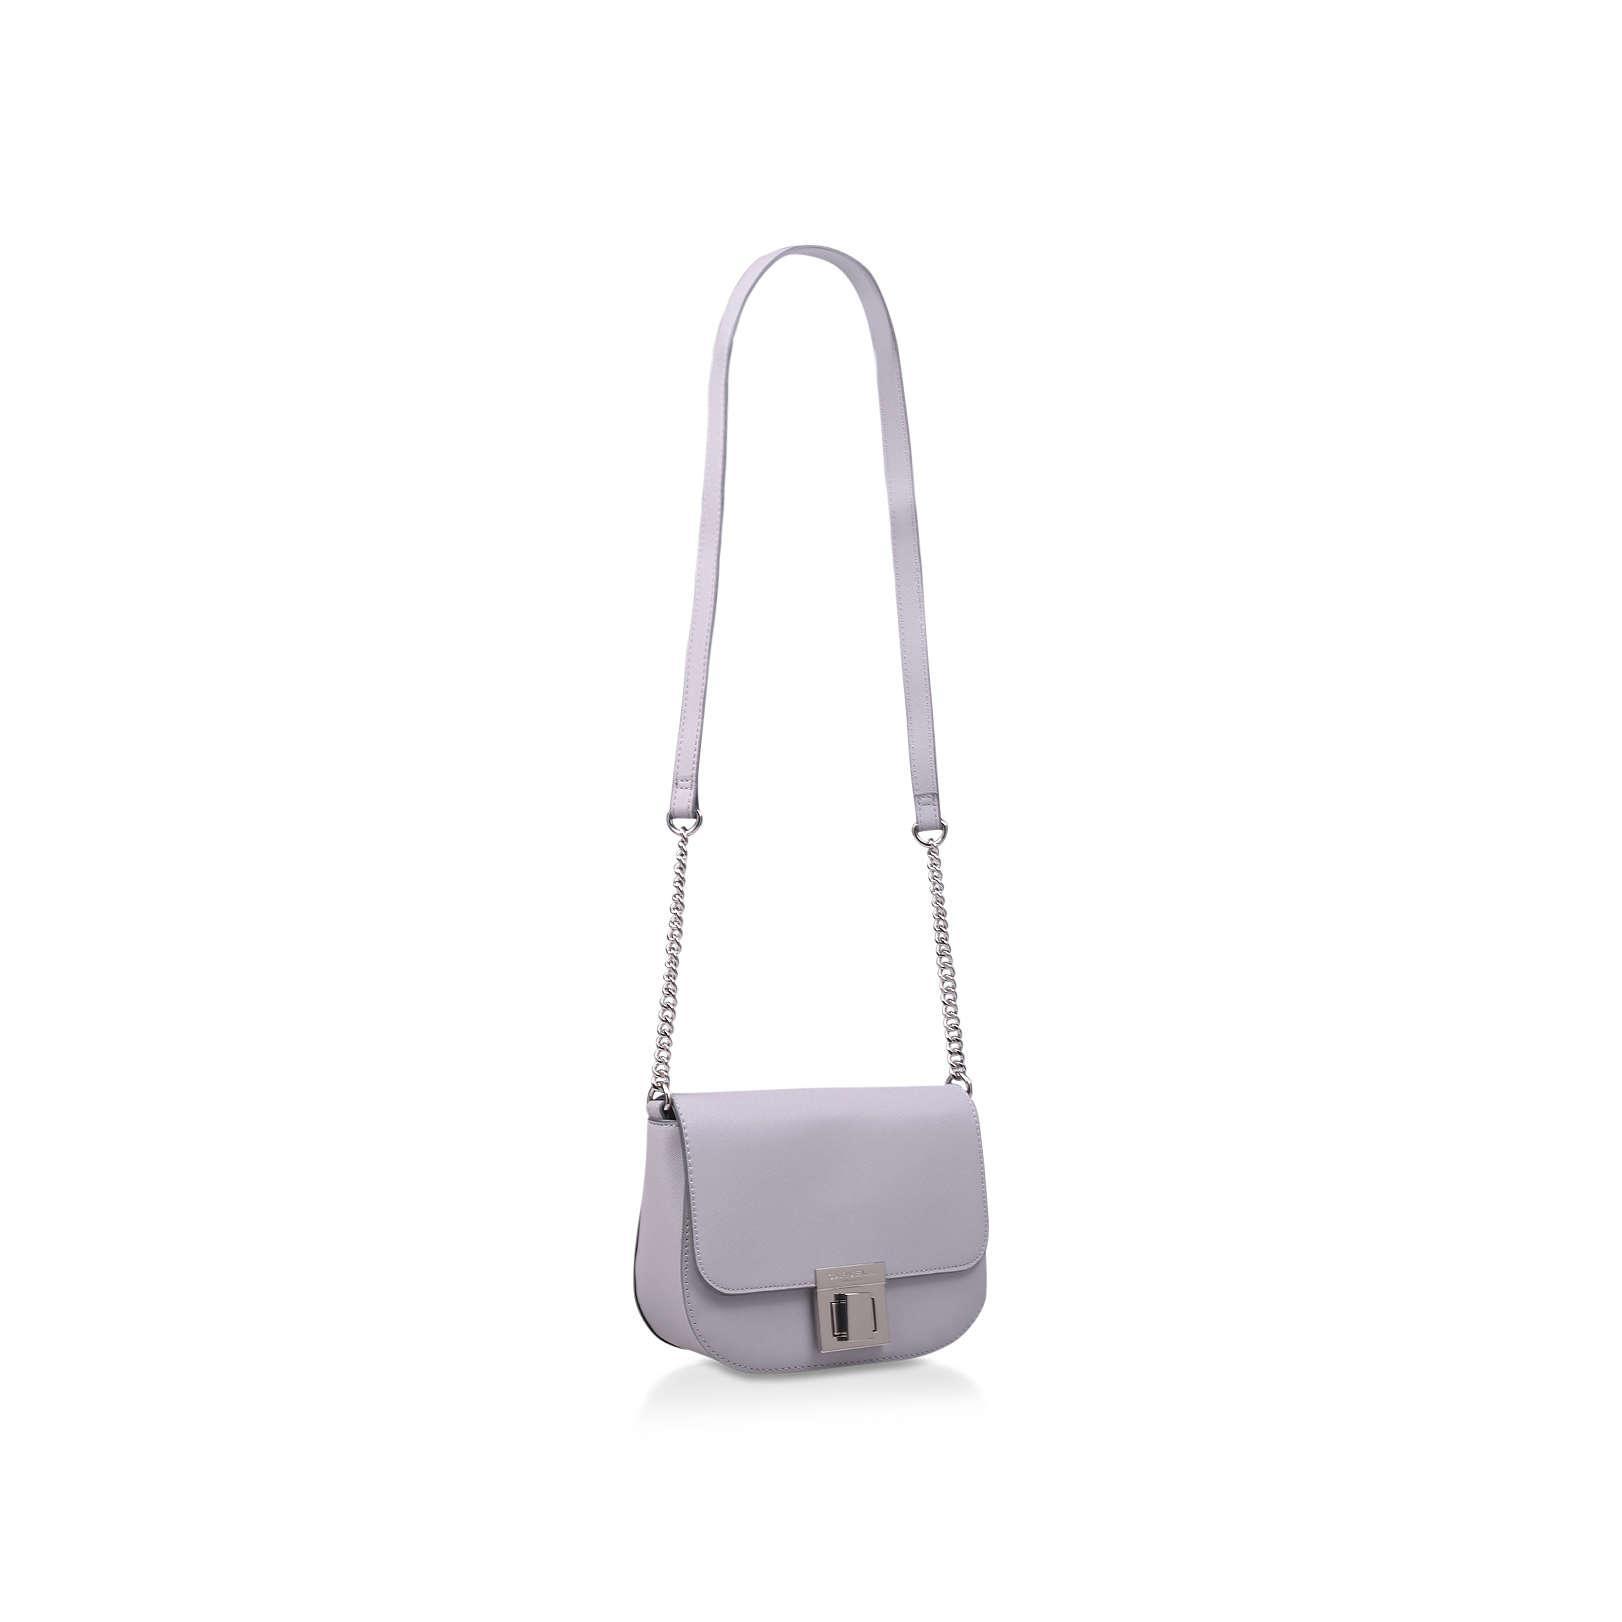 Carvela Kurt Geiger Sara Clean Saddle Bag in Gray - Lyst b2606c36cec6e